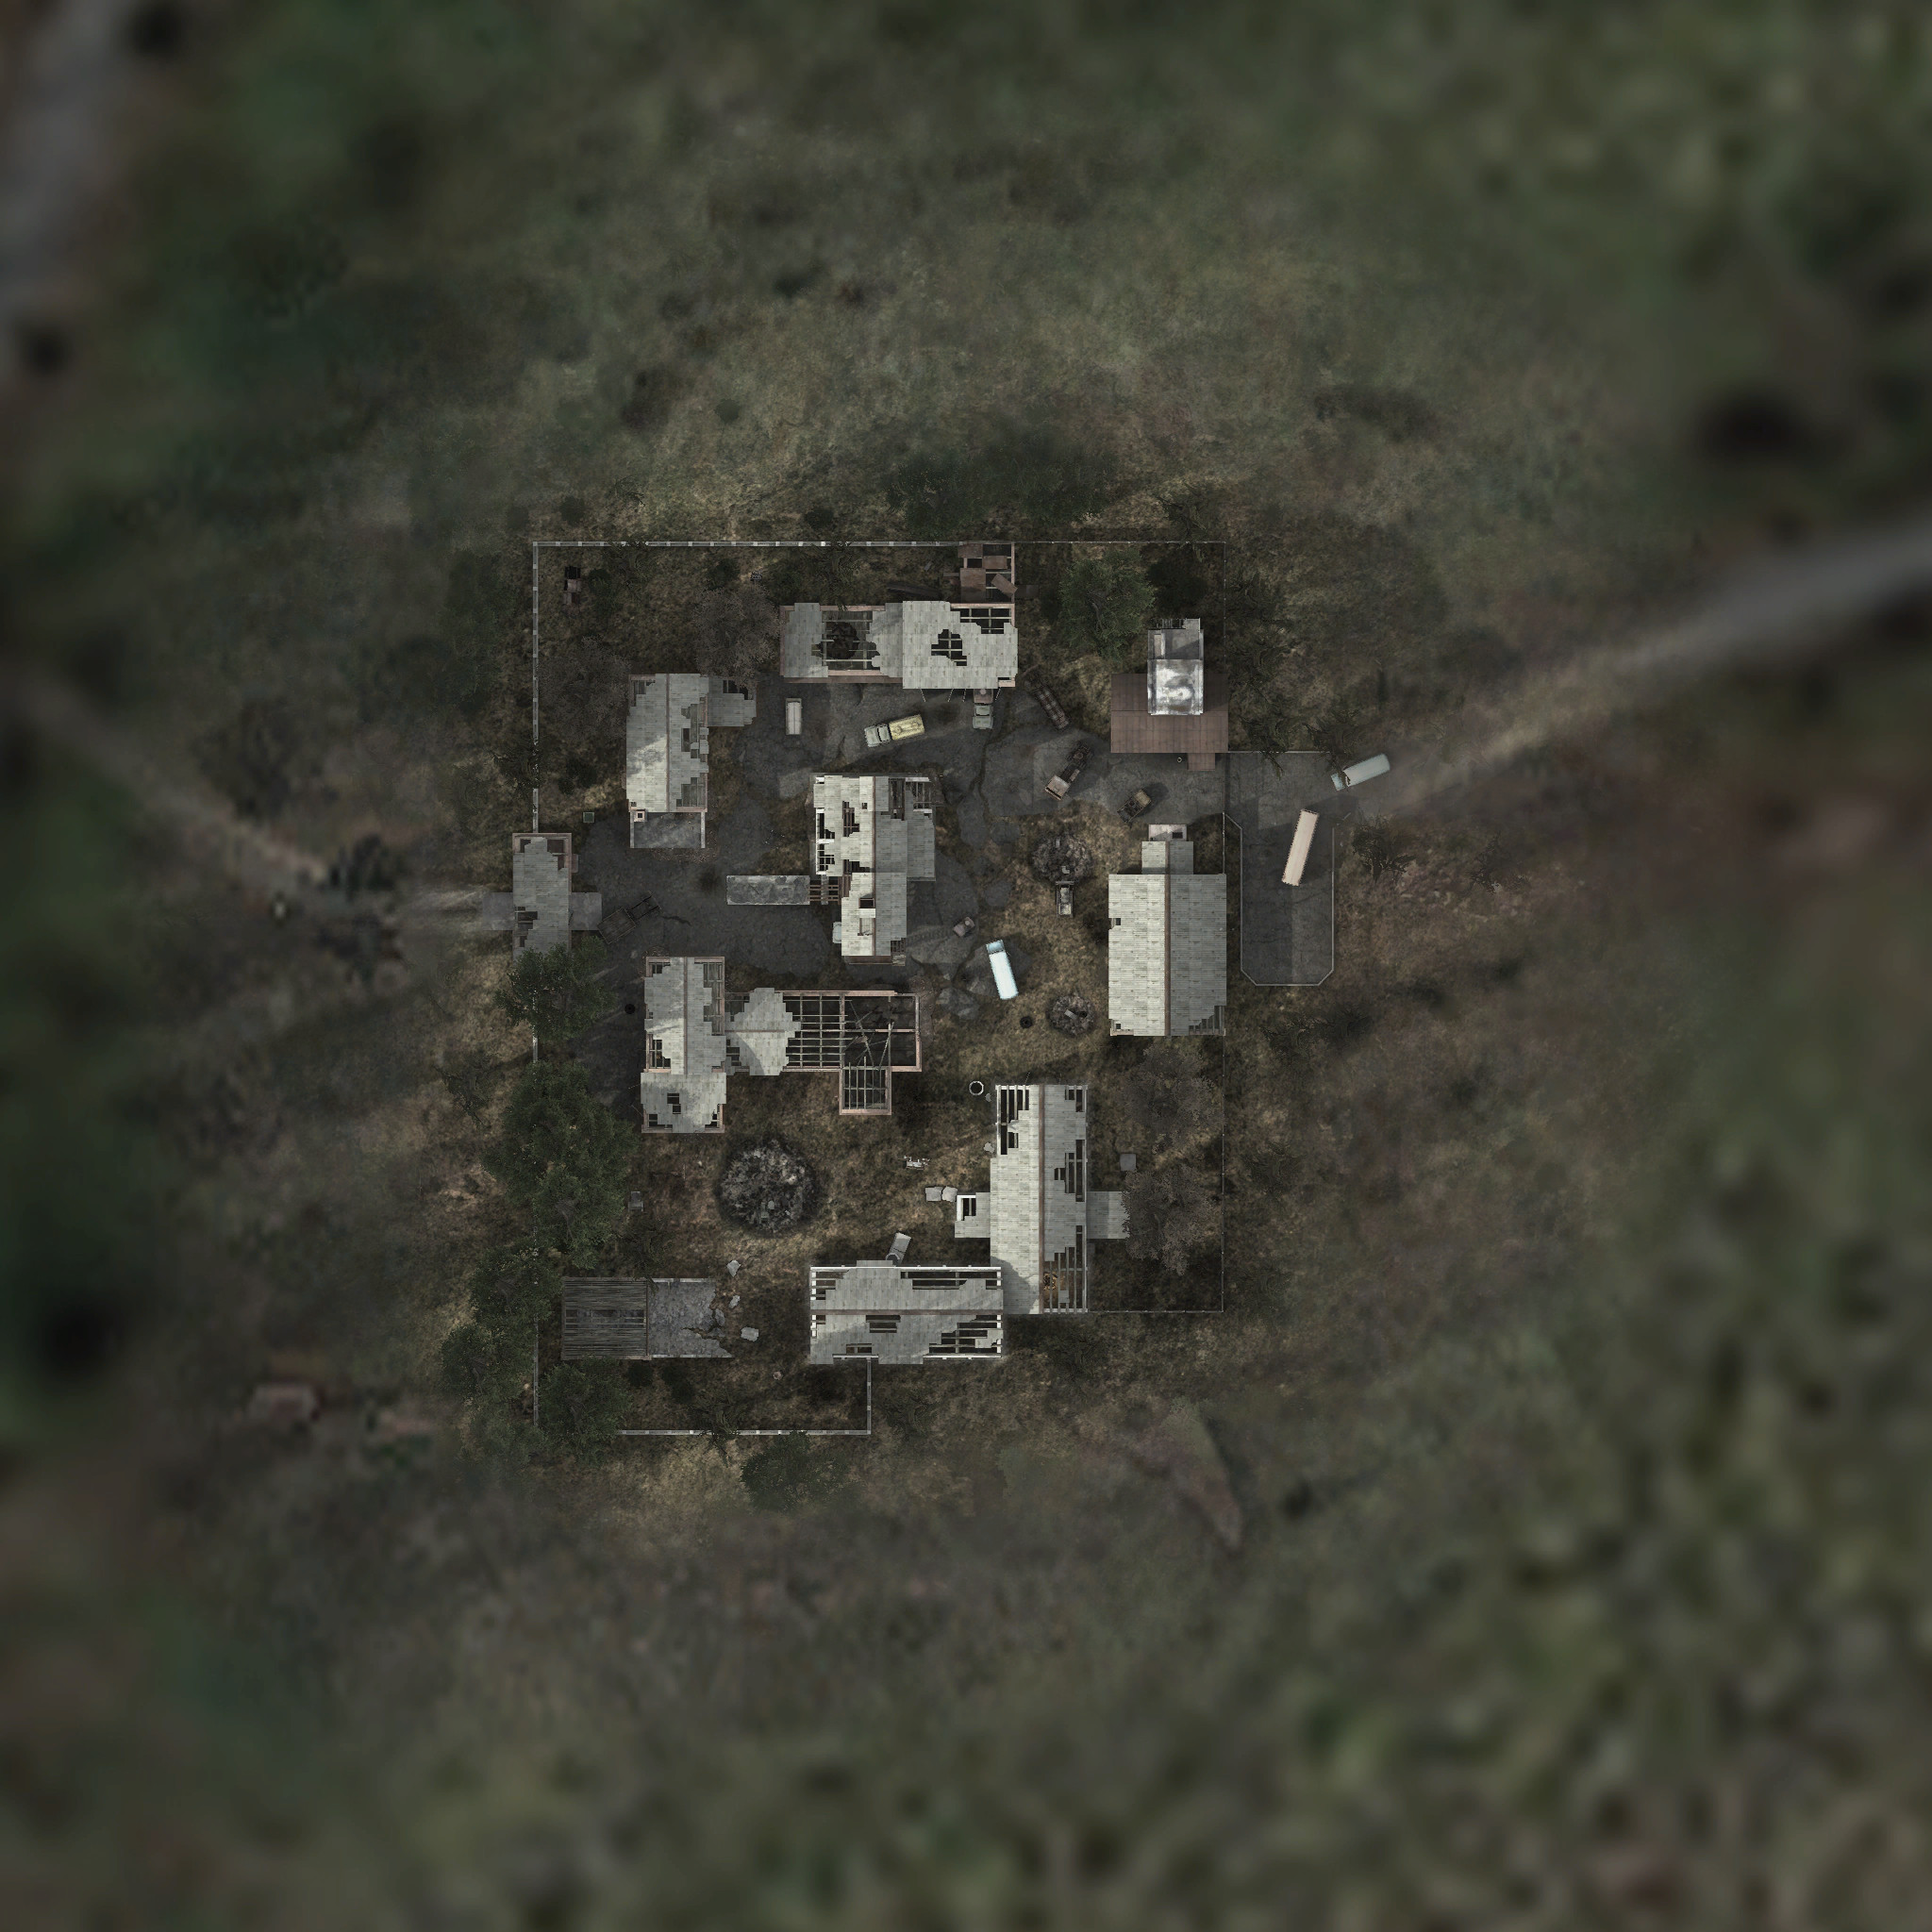 Картинка карта из игры сталкер